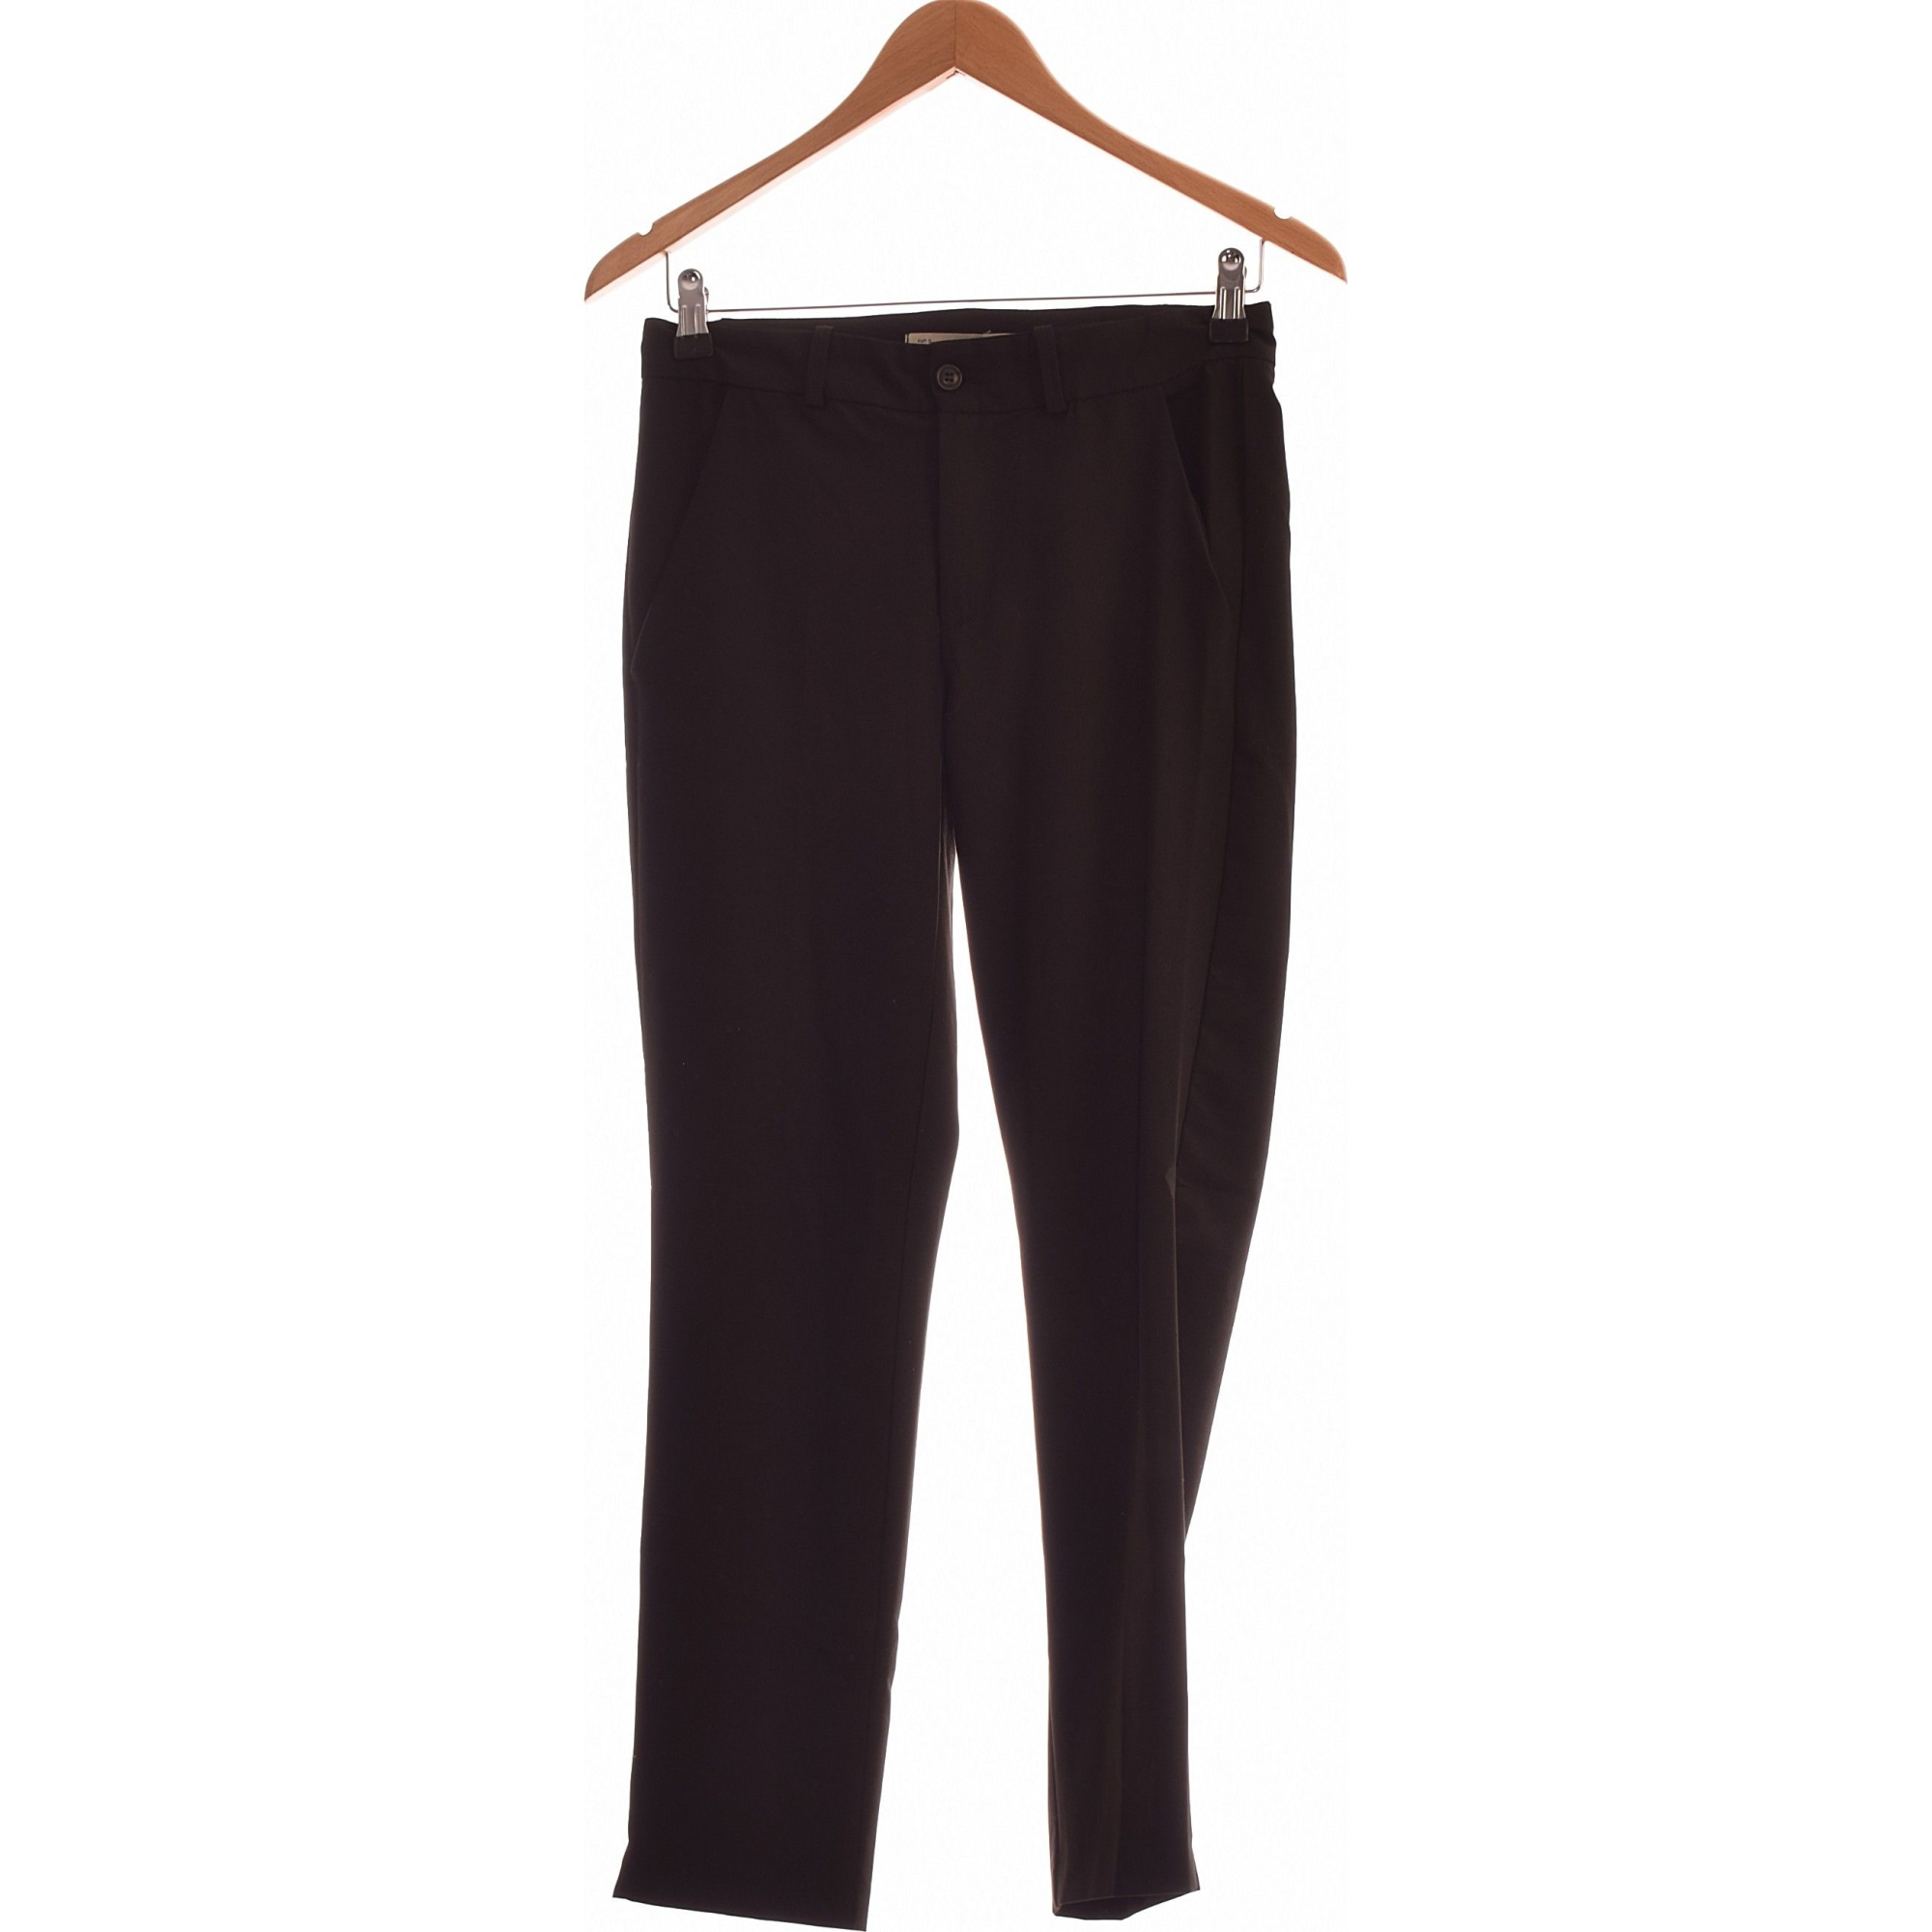 Pantalon slim, cigarette ZARA 36 (S, T1)